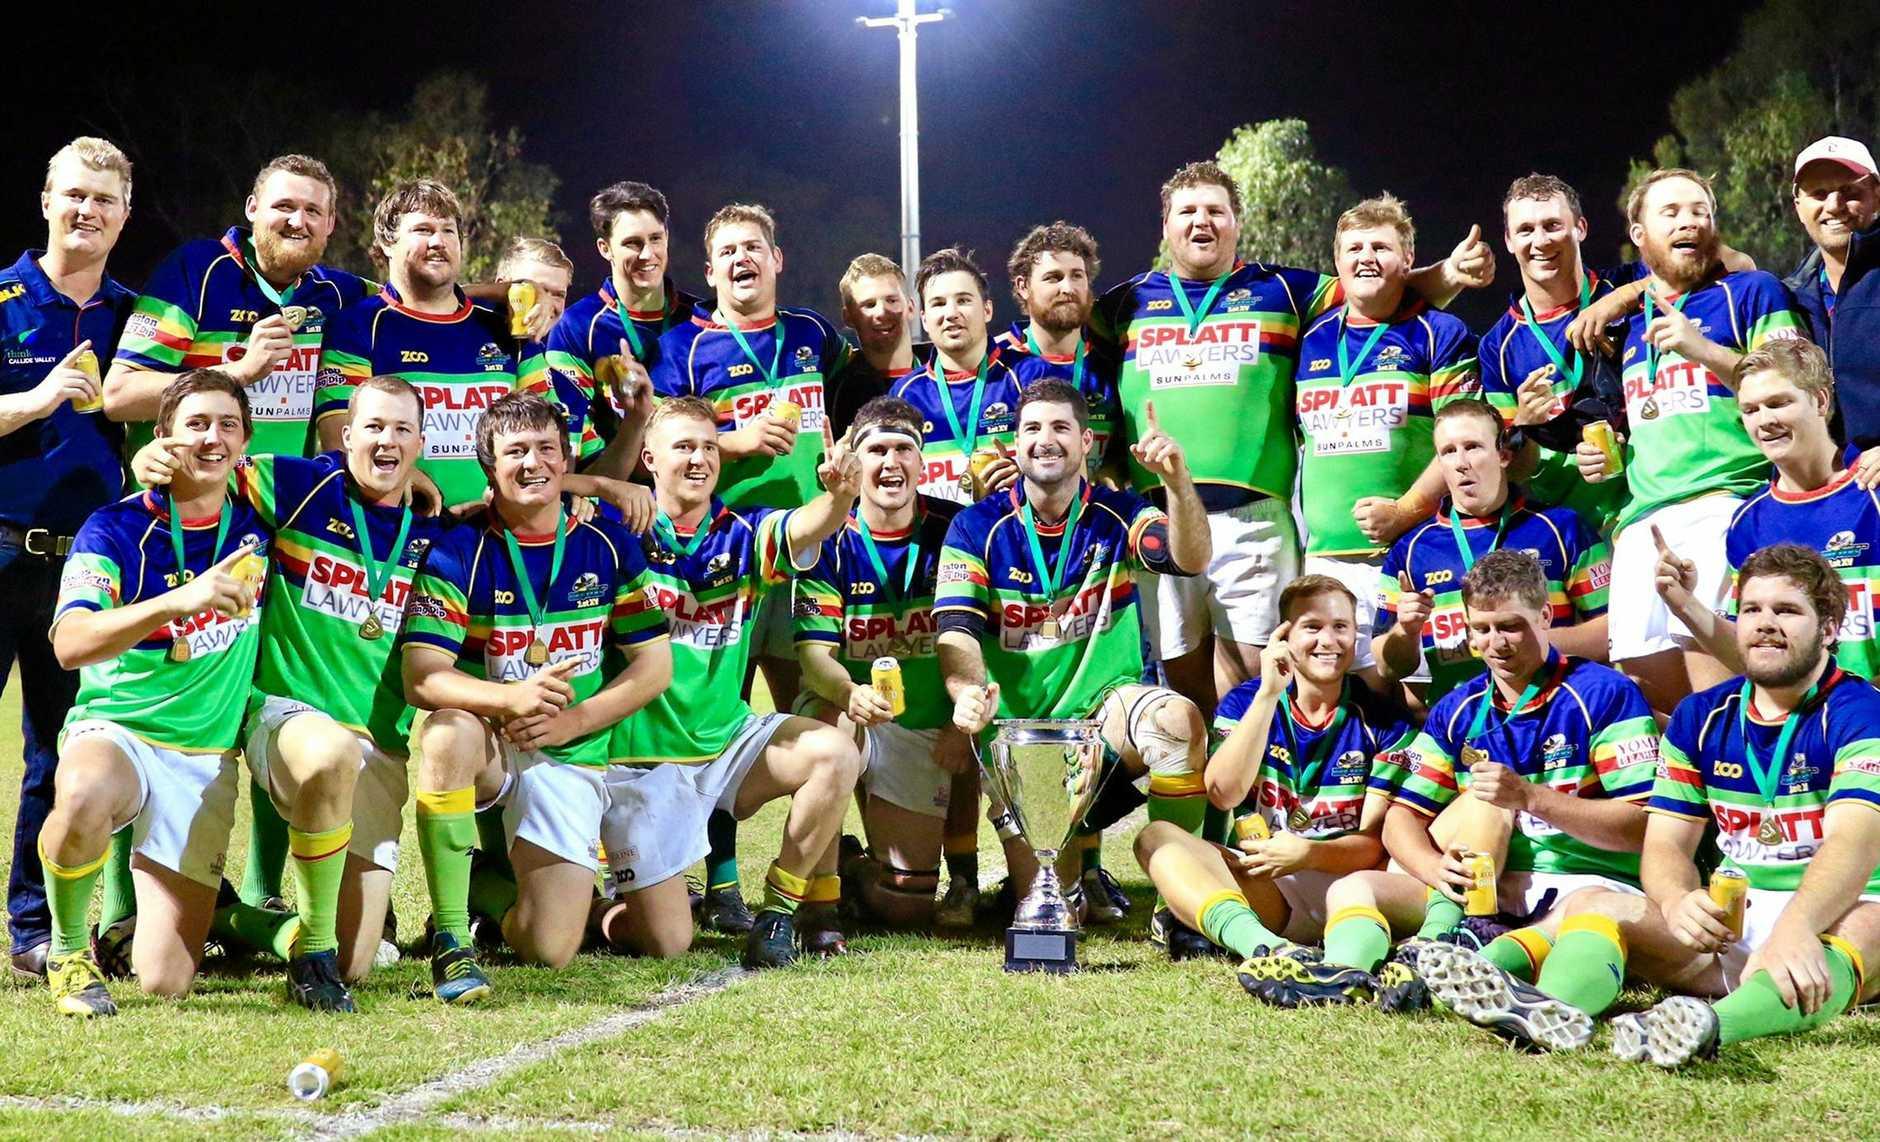 2017 - Rugy Union A Grade Grand Final winners - Dawson Valley